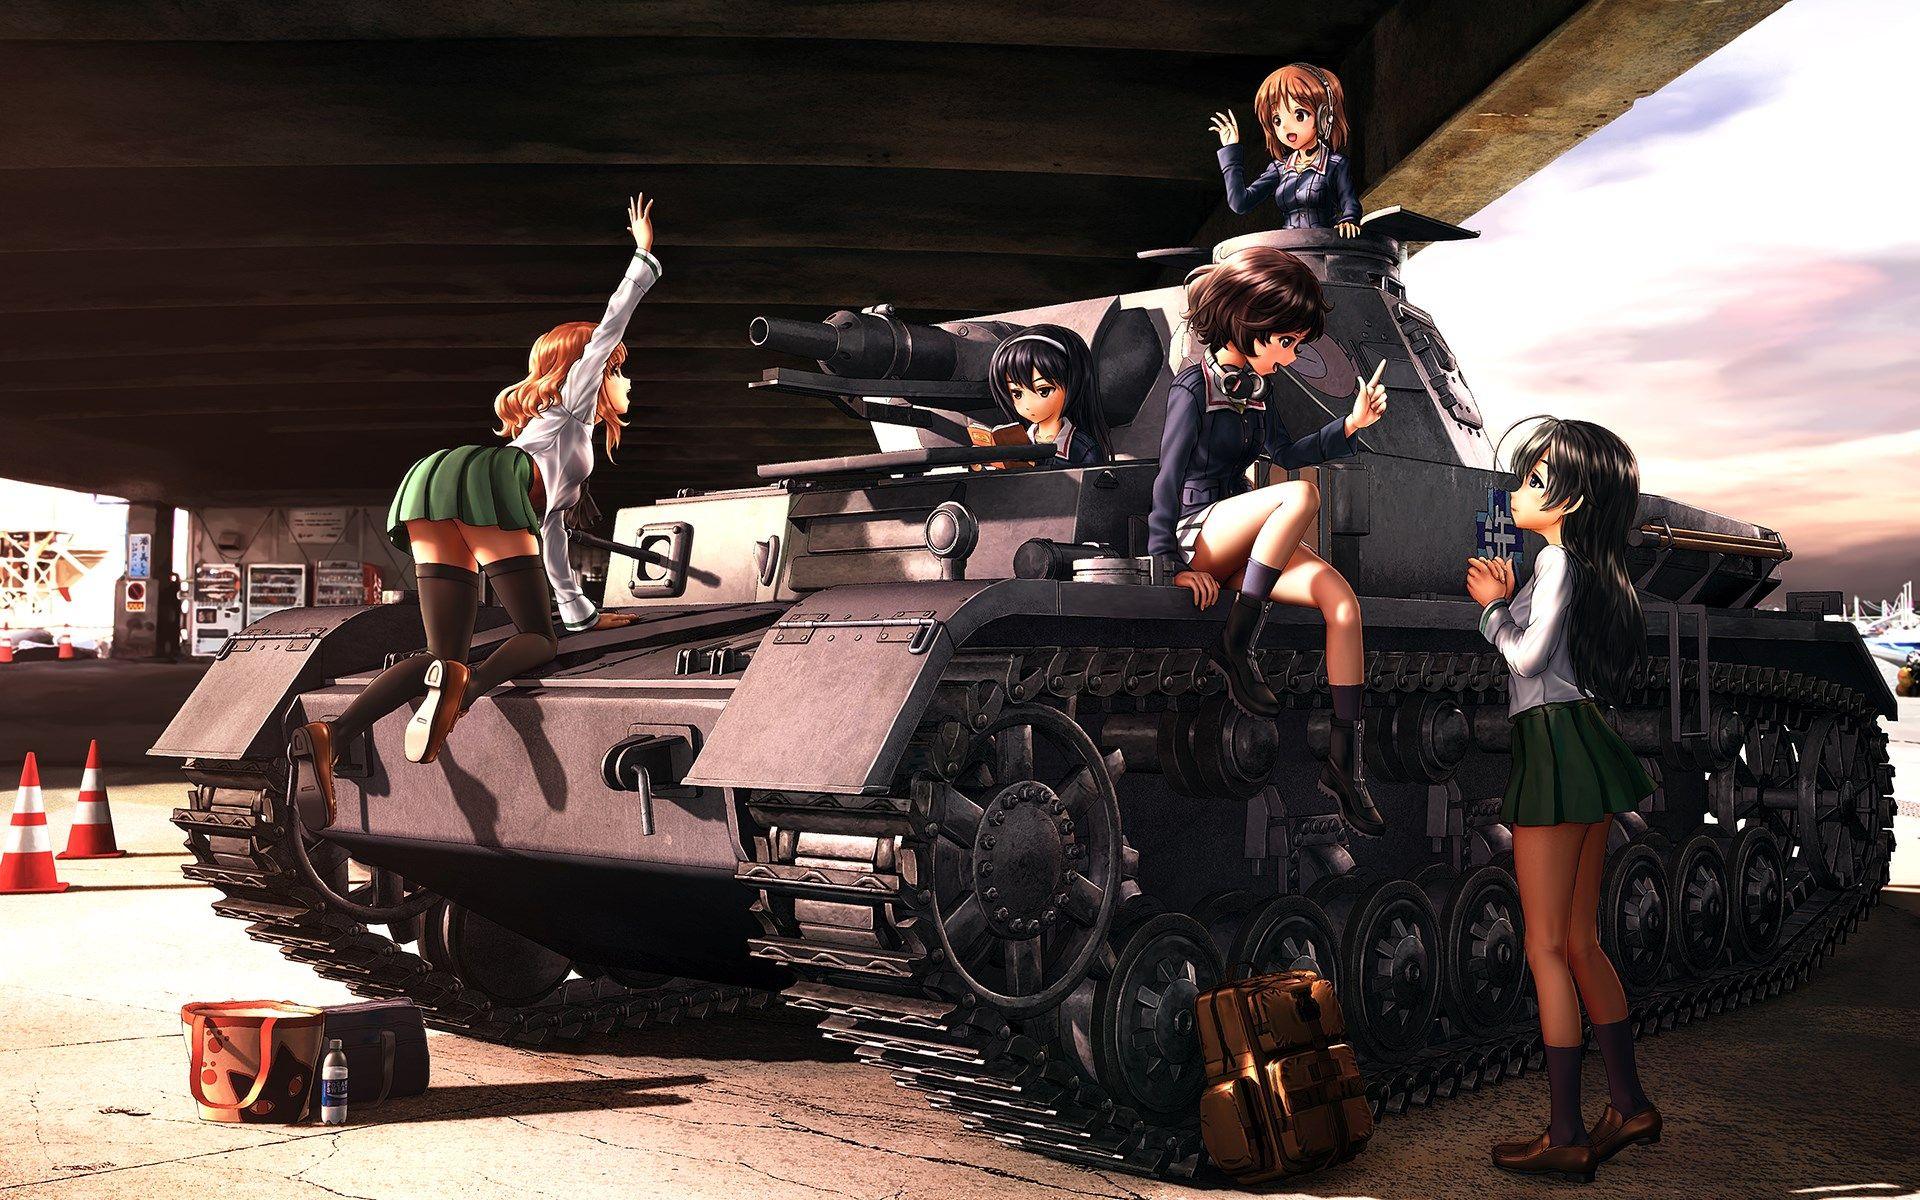 1920x1200 Px Quality Cool Girls Und Panzer Wallpaper By Crockett Cook For Pocketfullofgrace Com รถถ ง สาวอน เมะ ประว ต ศาสตร